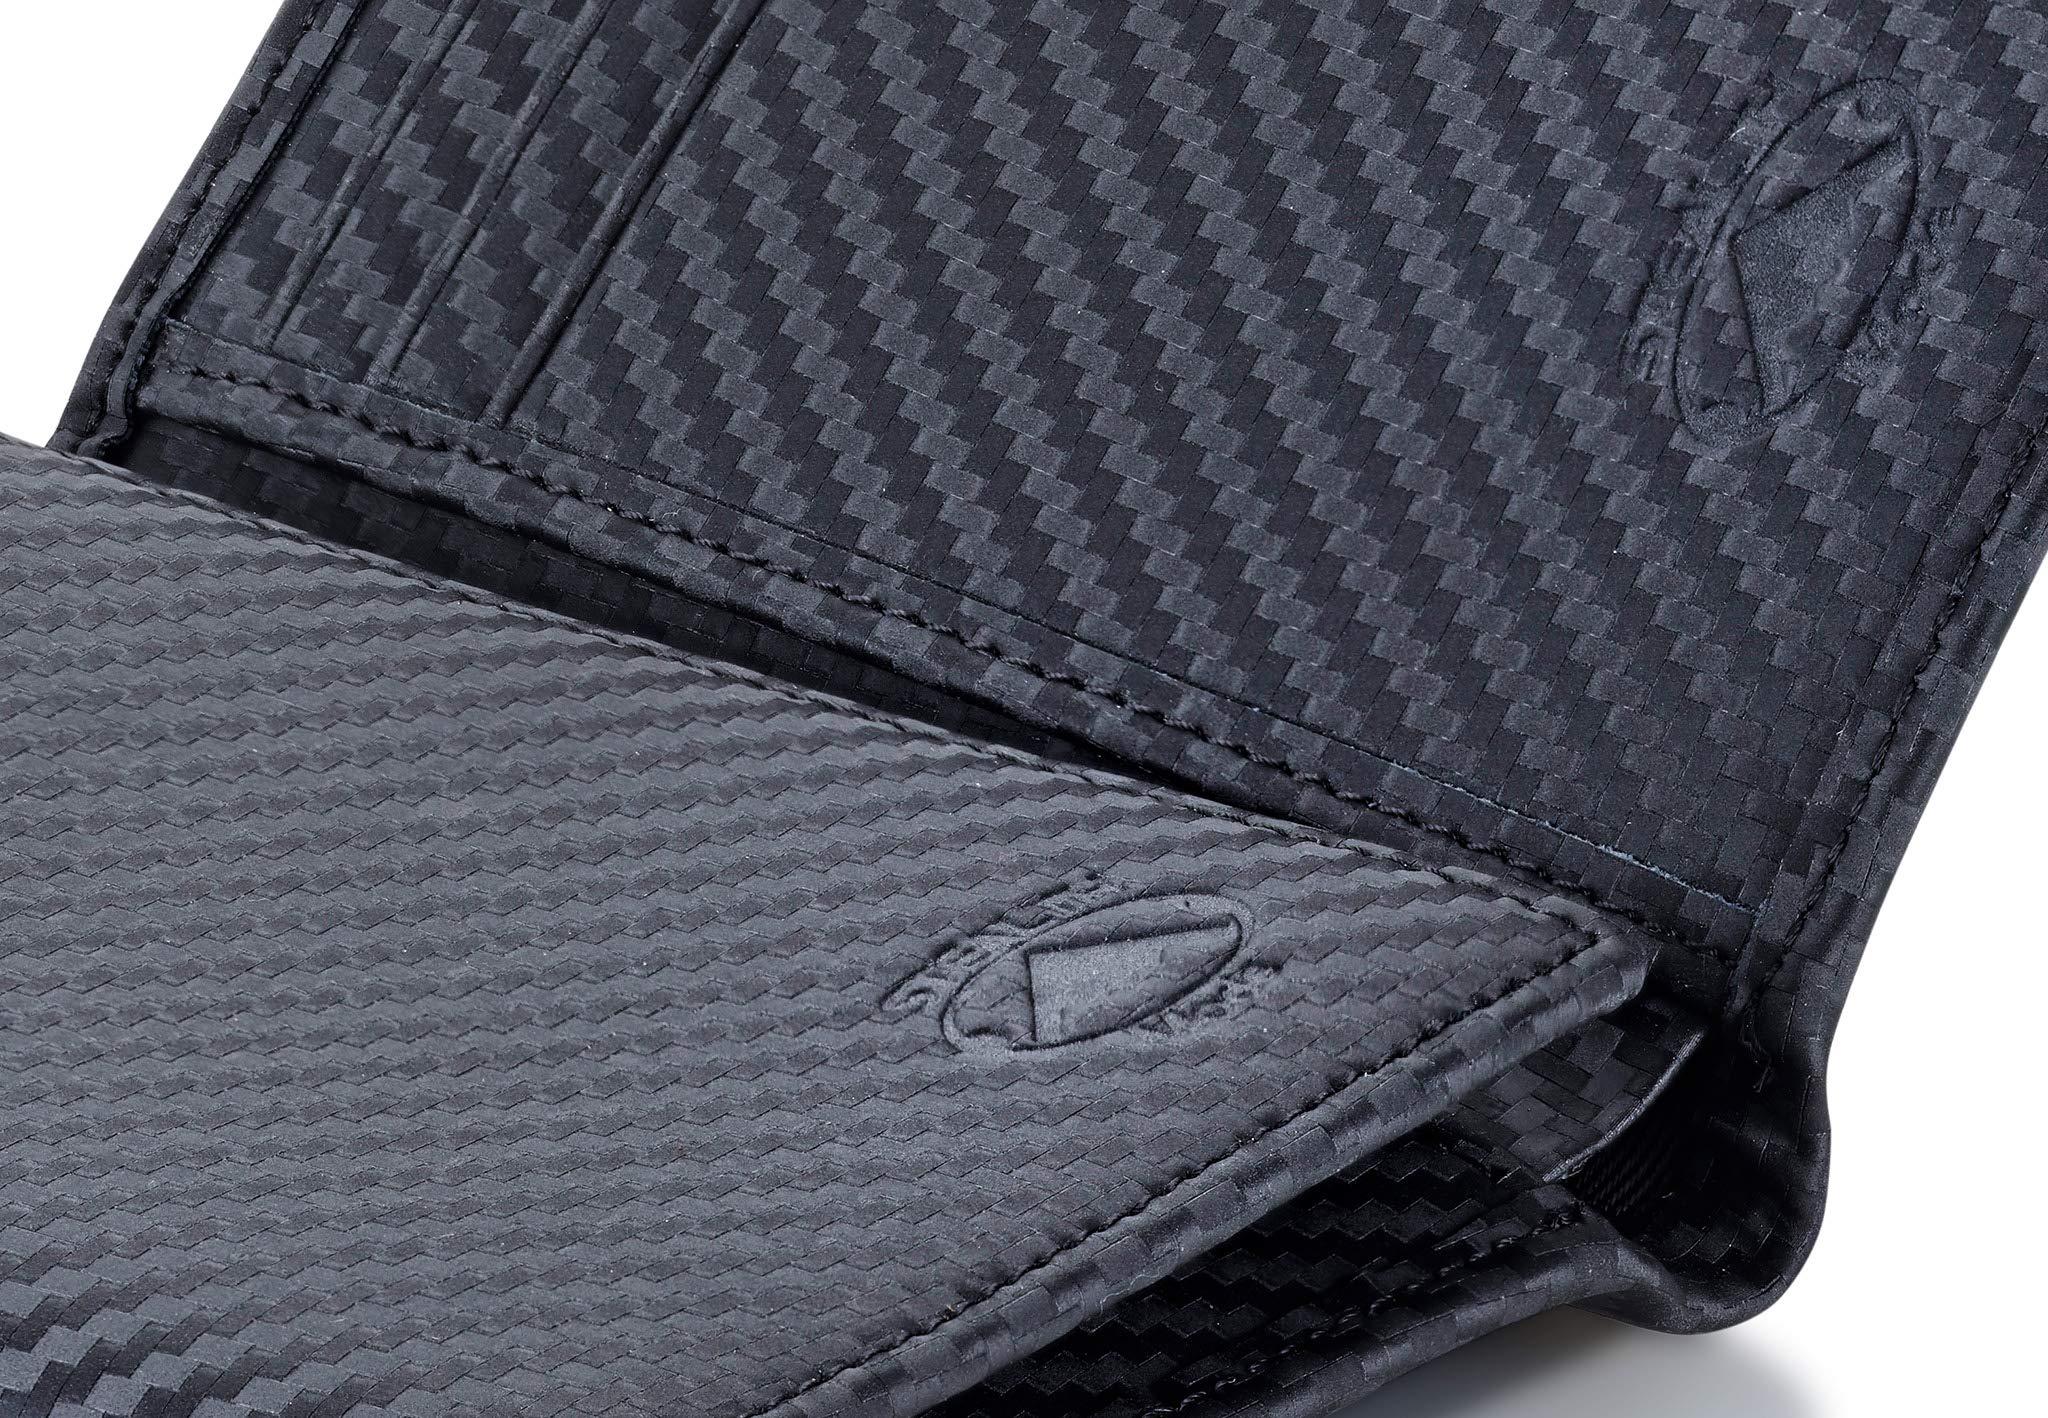 Stealth Mode Trifold RFID Blocking Carbon Fiber Wallet for Men by Stealth Mode (Image #5)